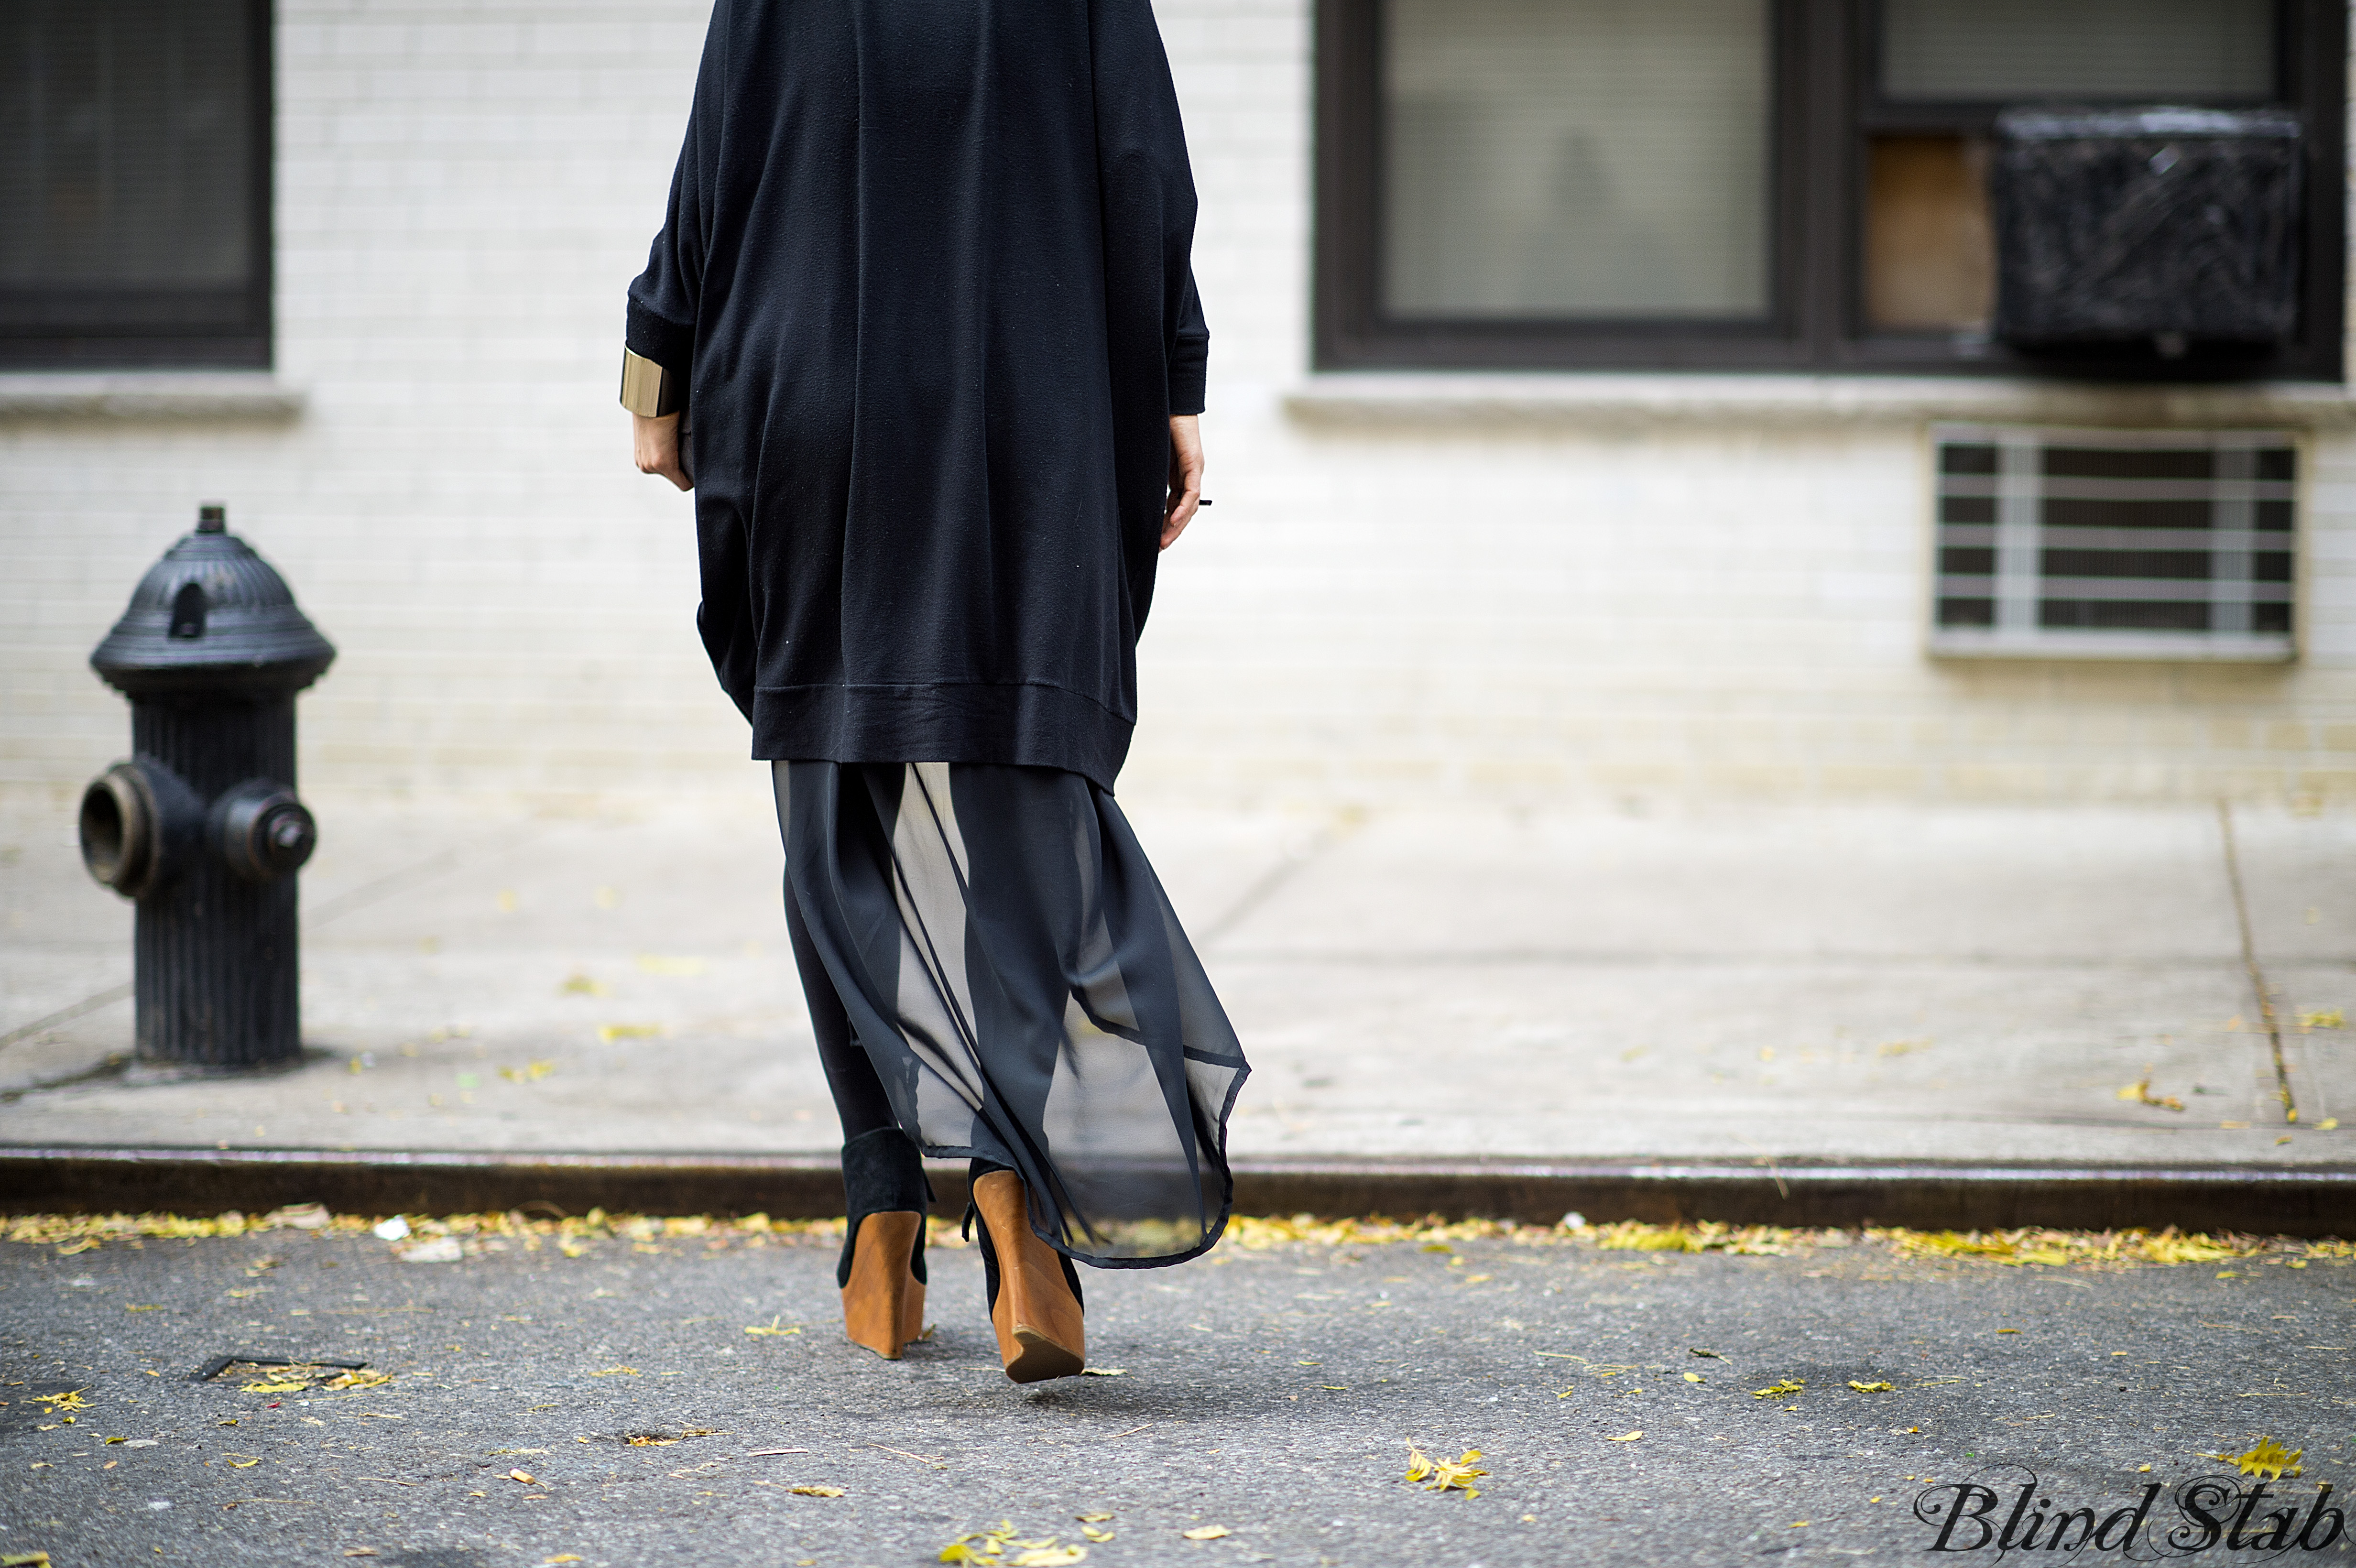 Wood-Platform-Shoes-Heels